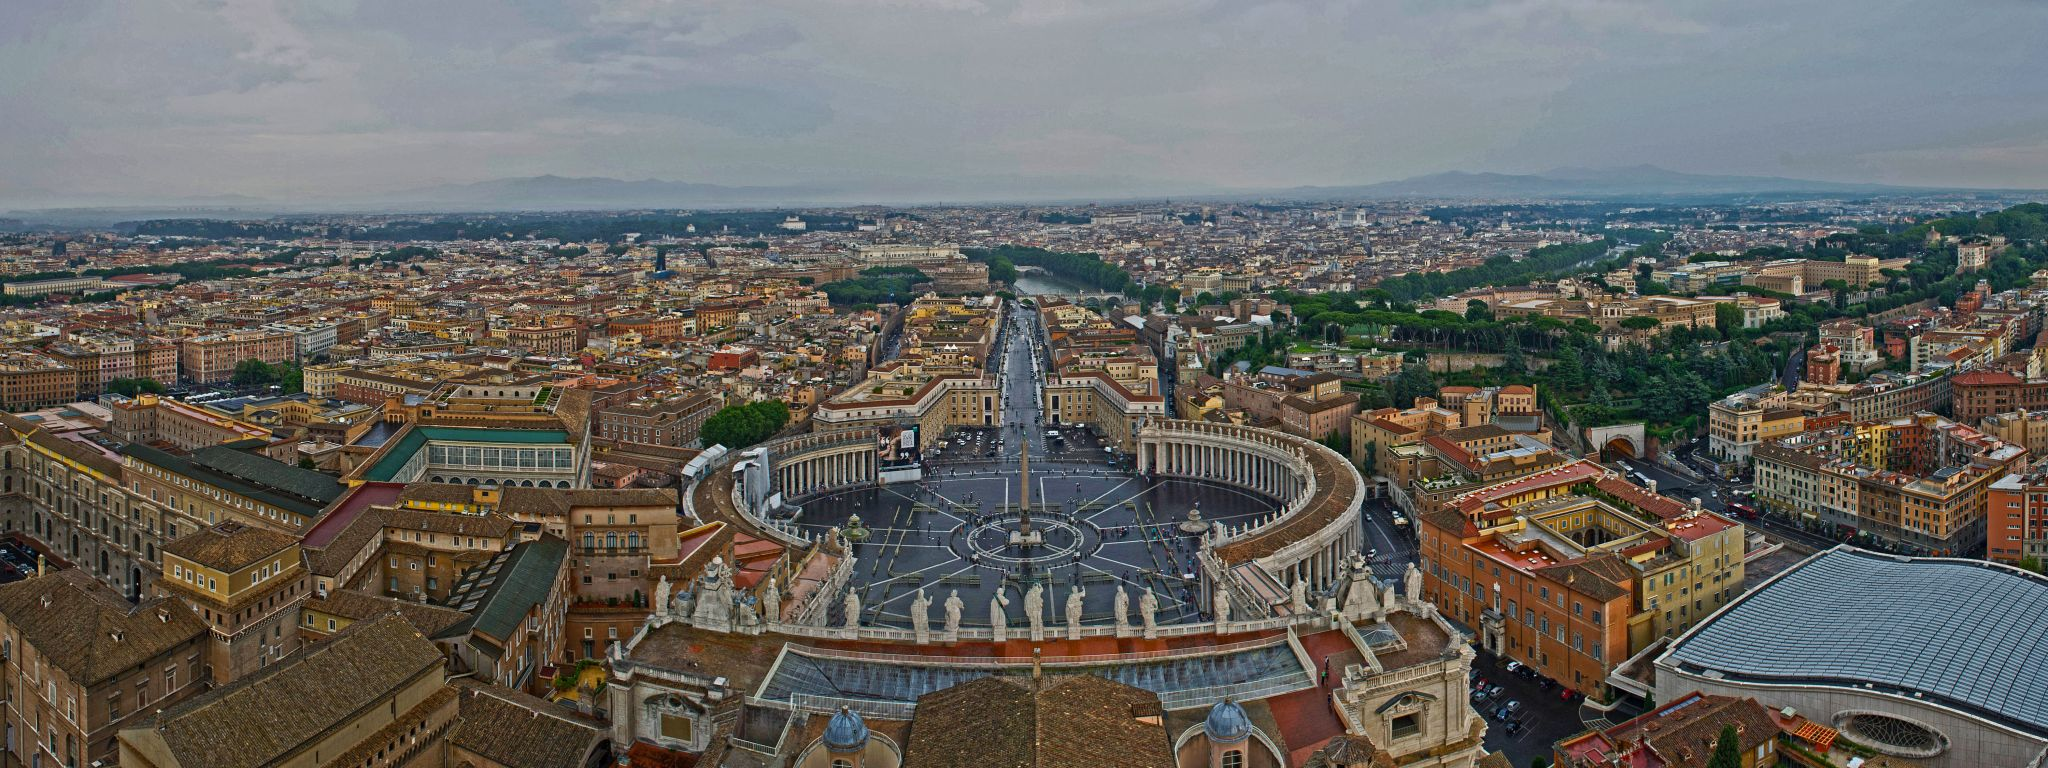 Vatican City, Vatican City State